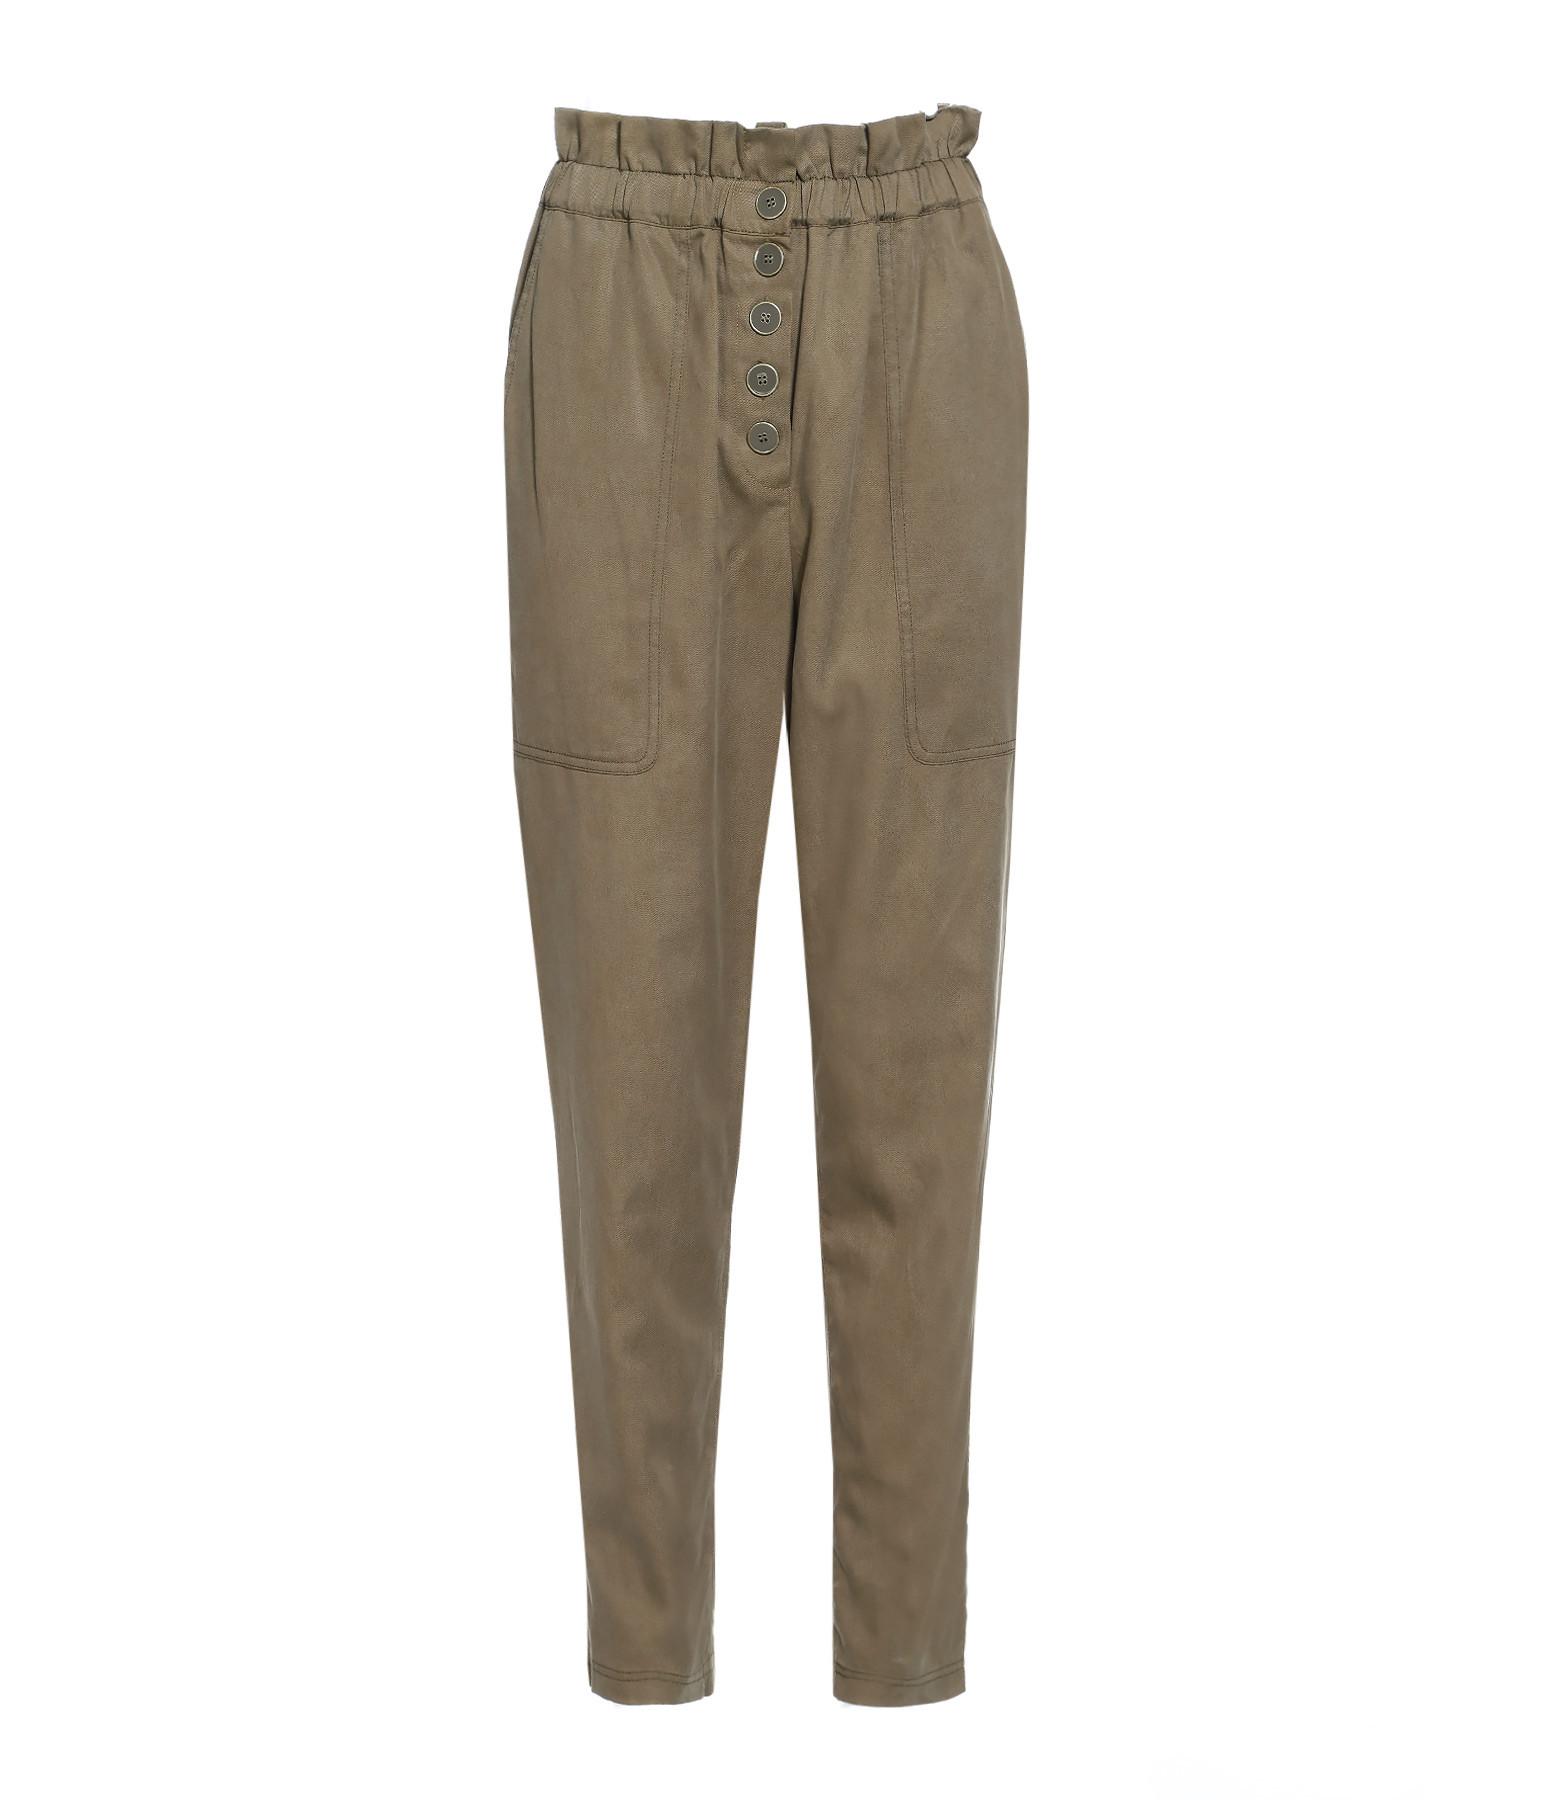 ULLAJOHN - Pantalon Owen Coton Militaire